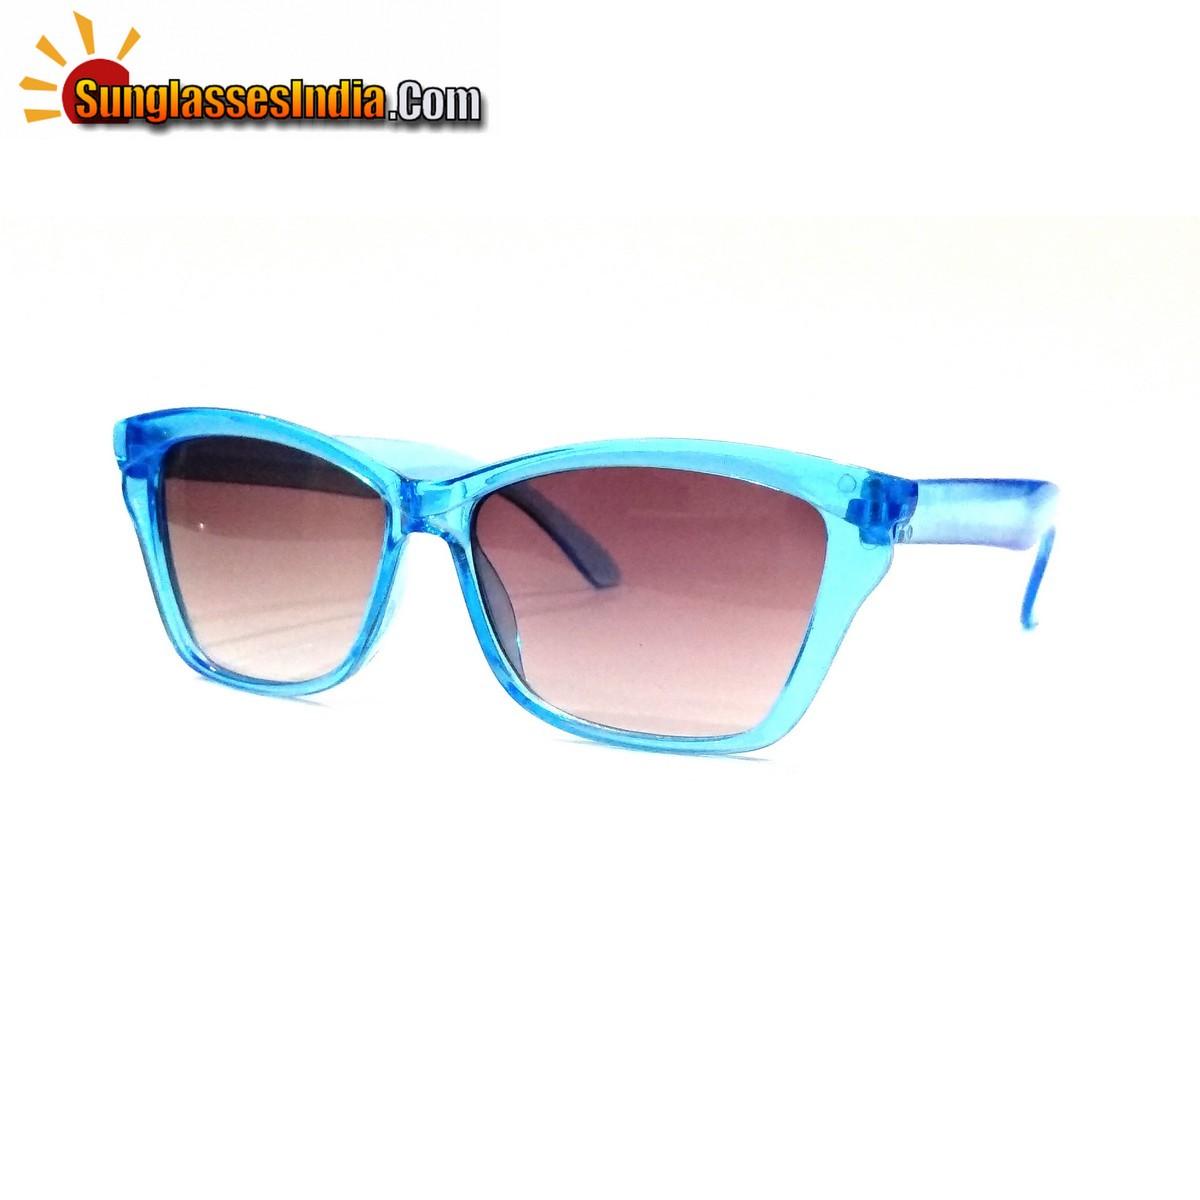 Blue Kids Fashion Sunglasses TKS003Blue